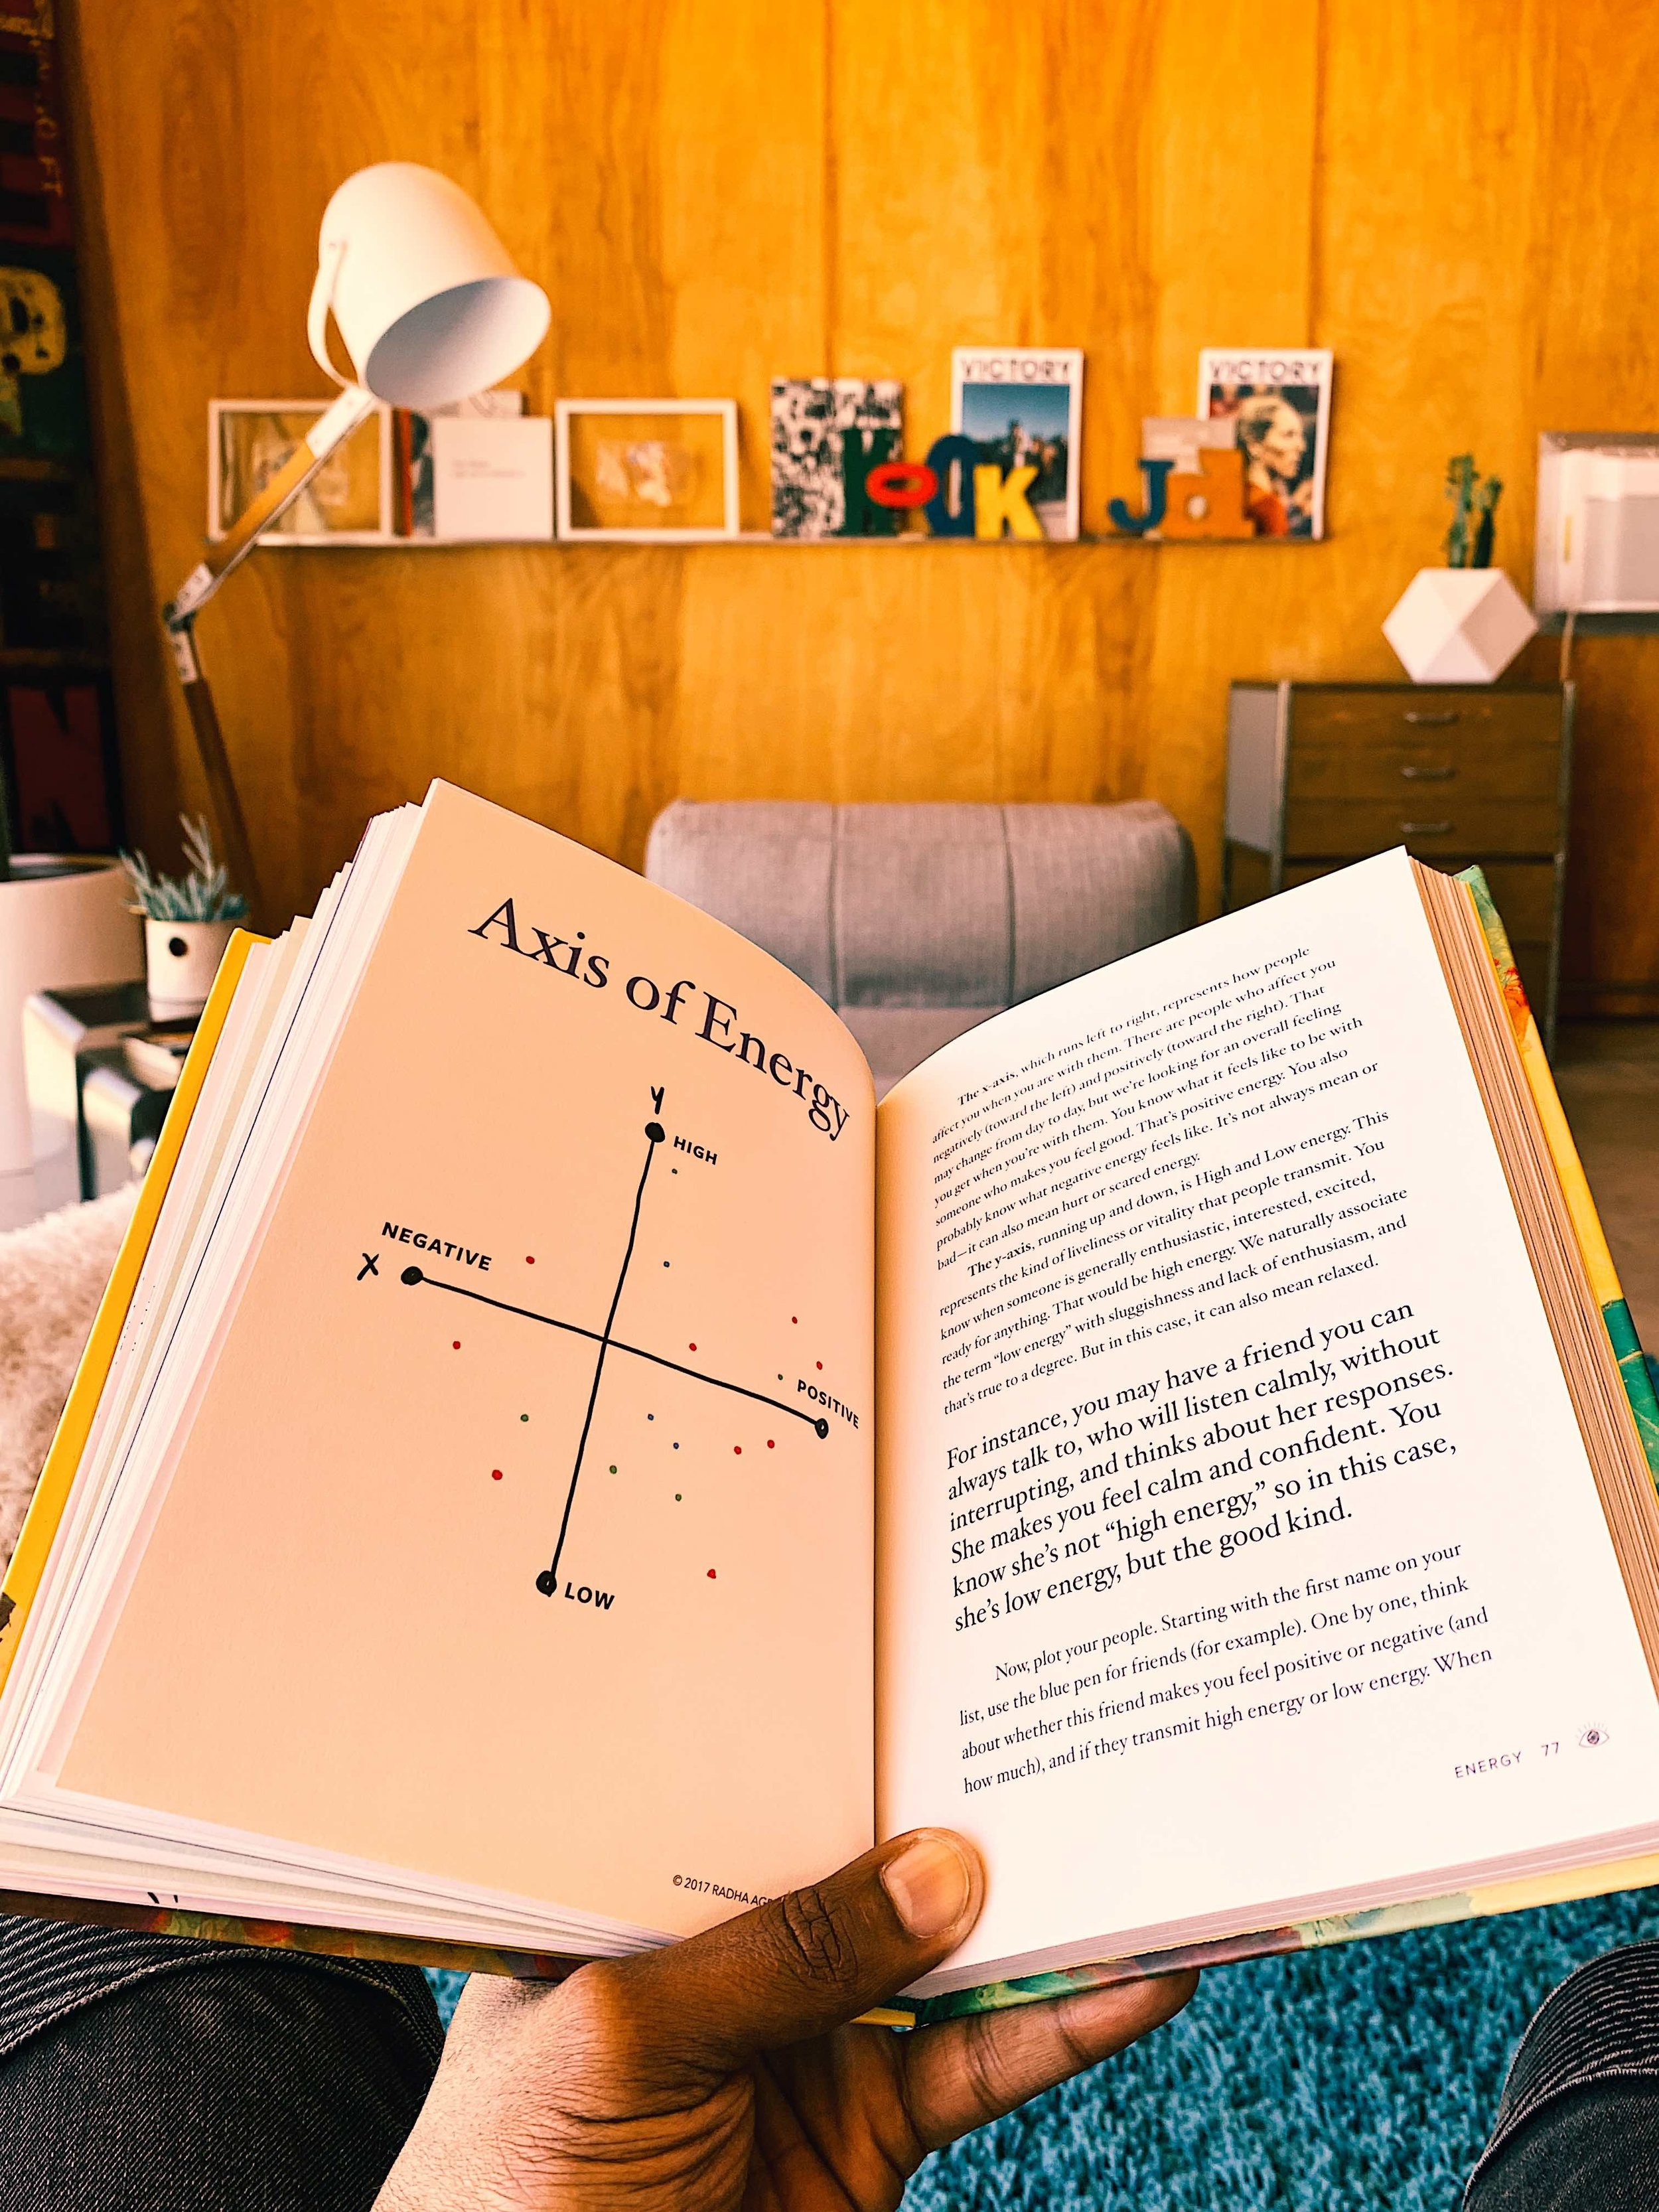 airbnb-art loft-joshua tree - cj johnson - cjjohnsonjr - 12.jpg